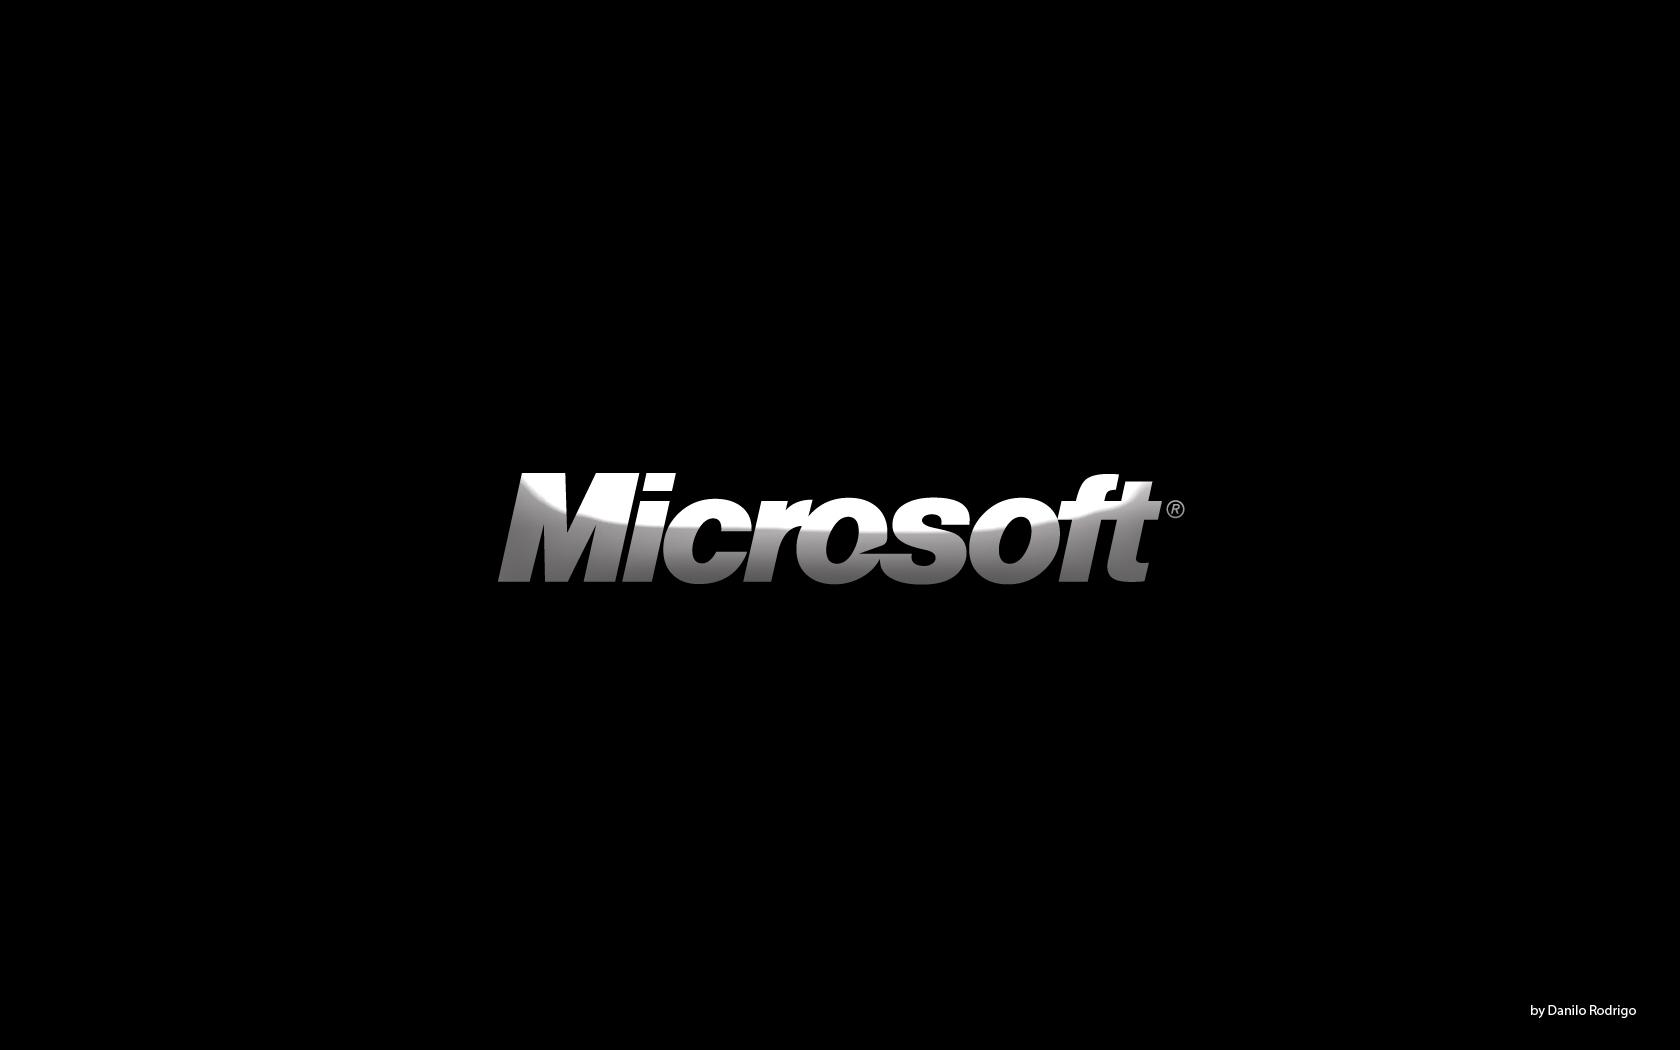 Free Microsoft Wallpaper